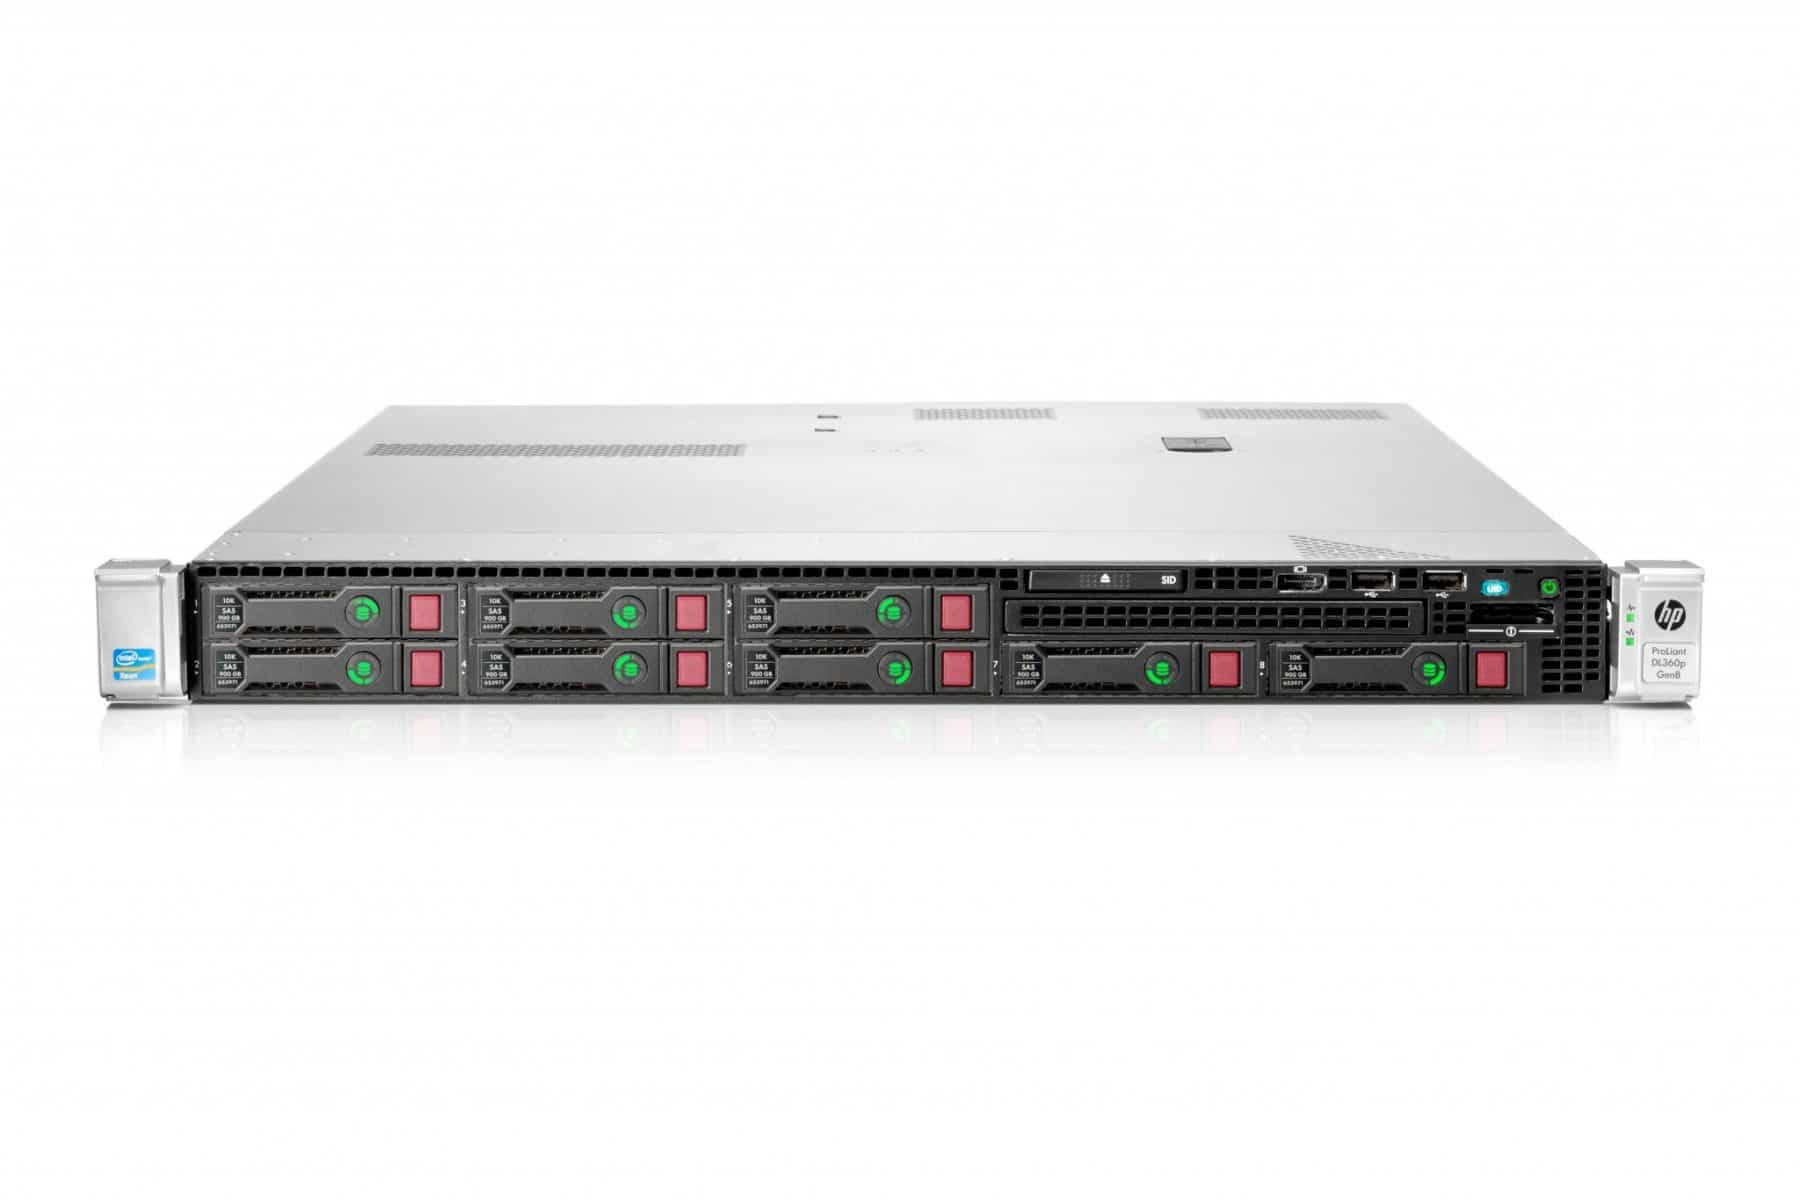 HP-Proliant-DL360-G8-Server-Front-View-2-1-2-2-3-1-3-1-1.jpg